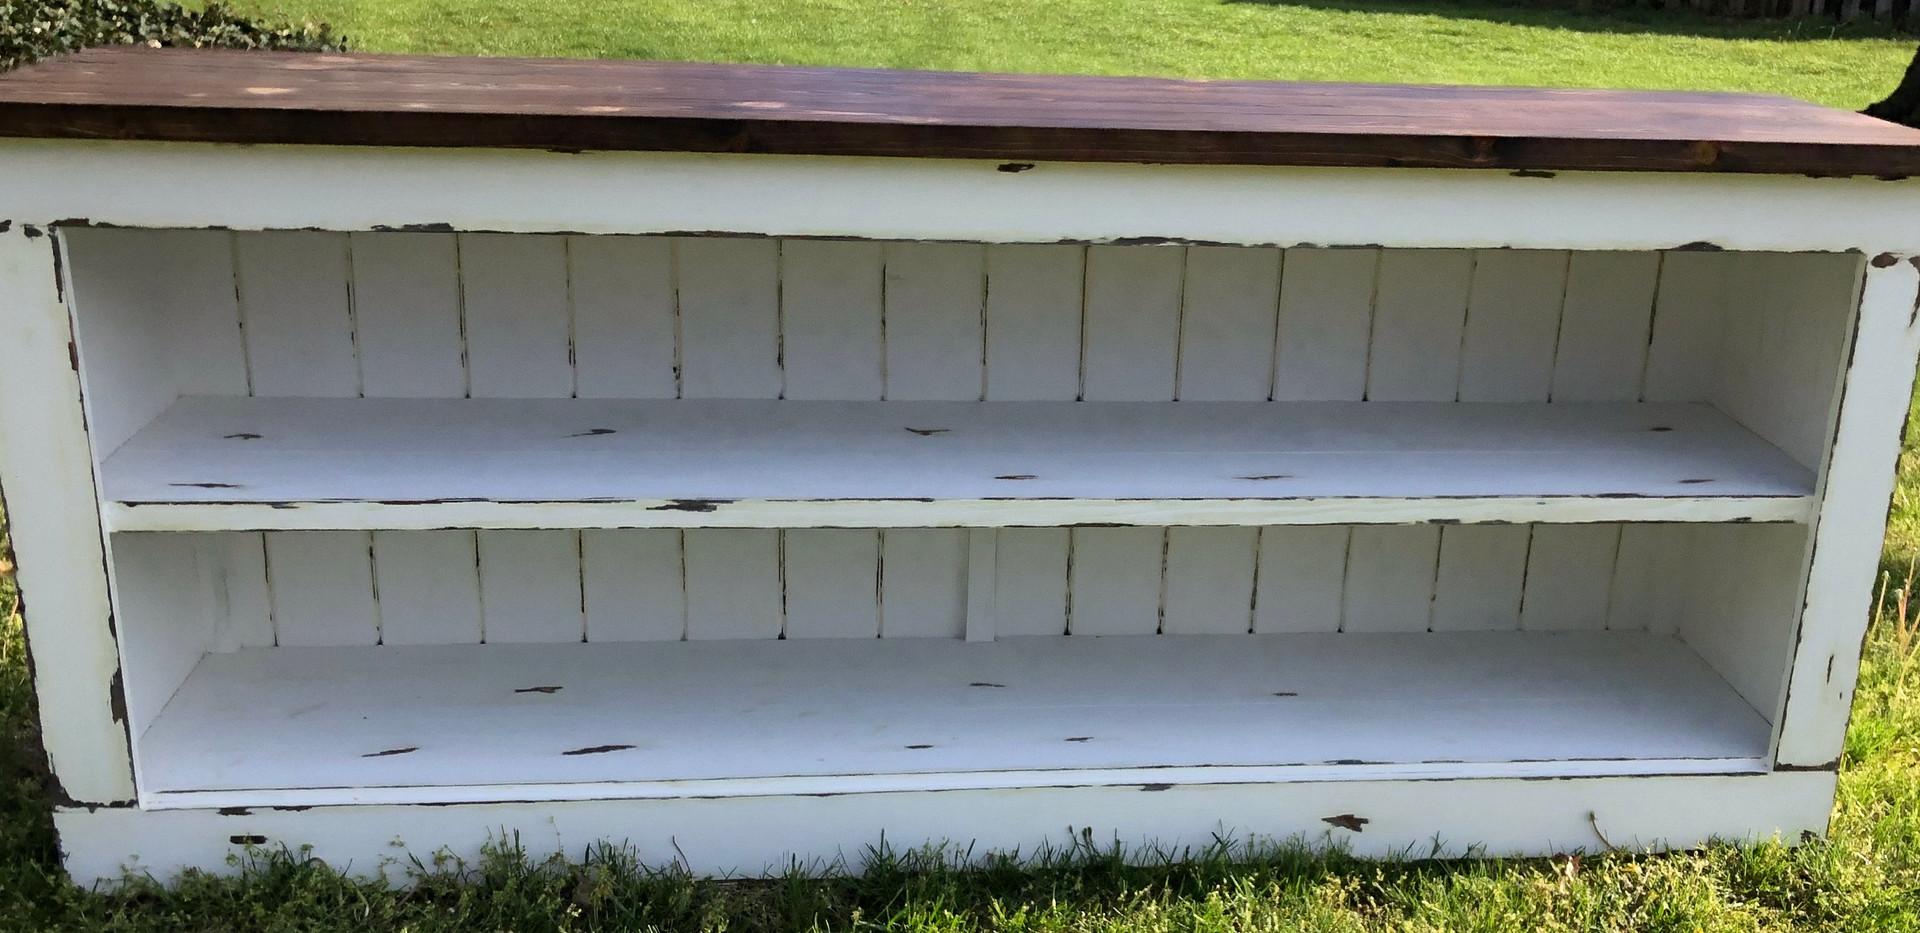 IMMaro Farmhouse Console Paneling Distressed XG_3826.jpeg